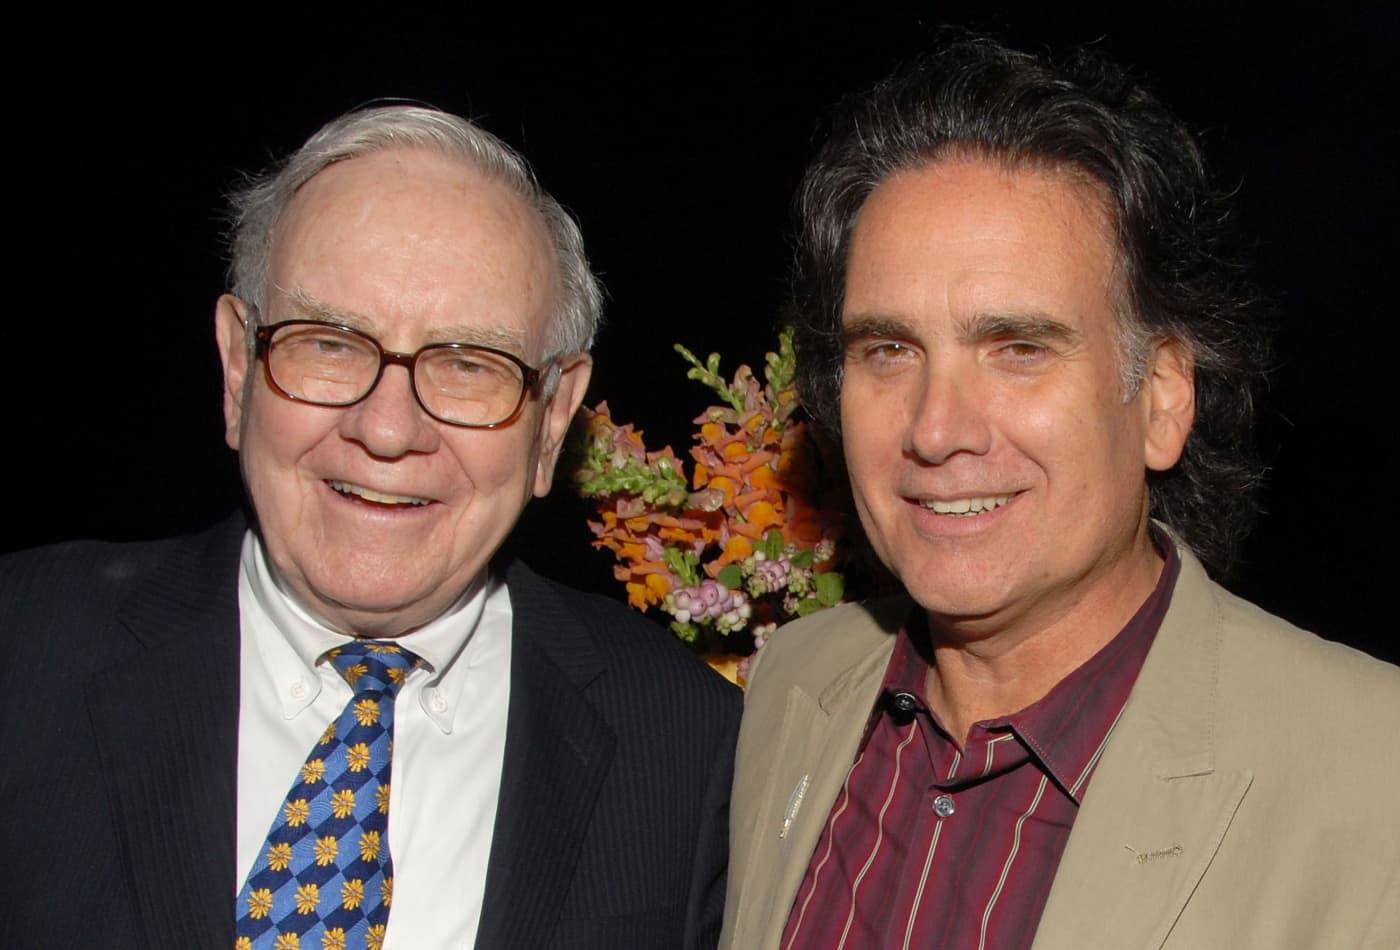 How Warren Buffett's son spent the $90,000 of Berkshire stock he got at 19—worth $200 million now: 'I don't regret it'